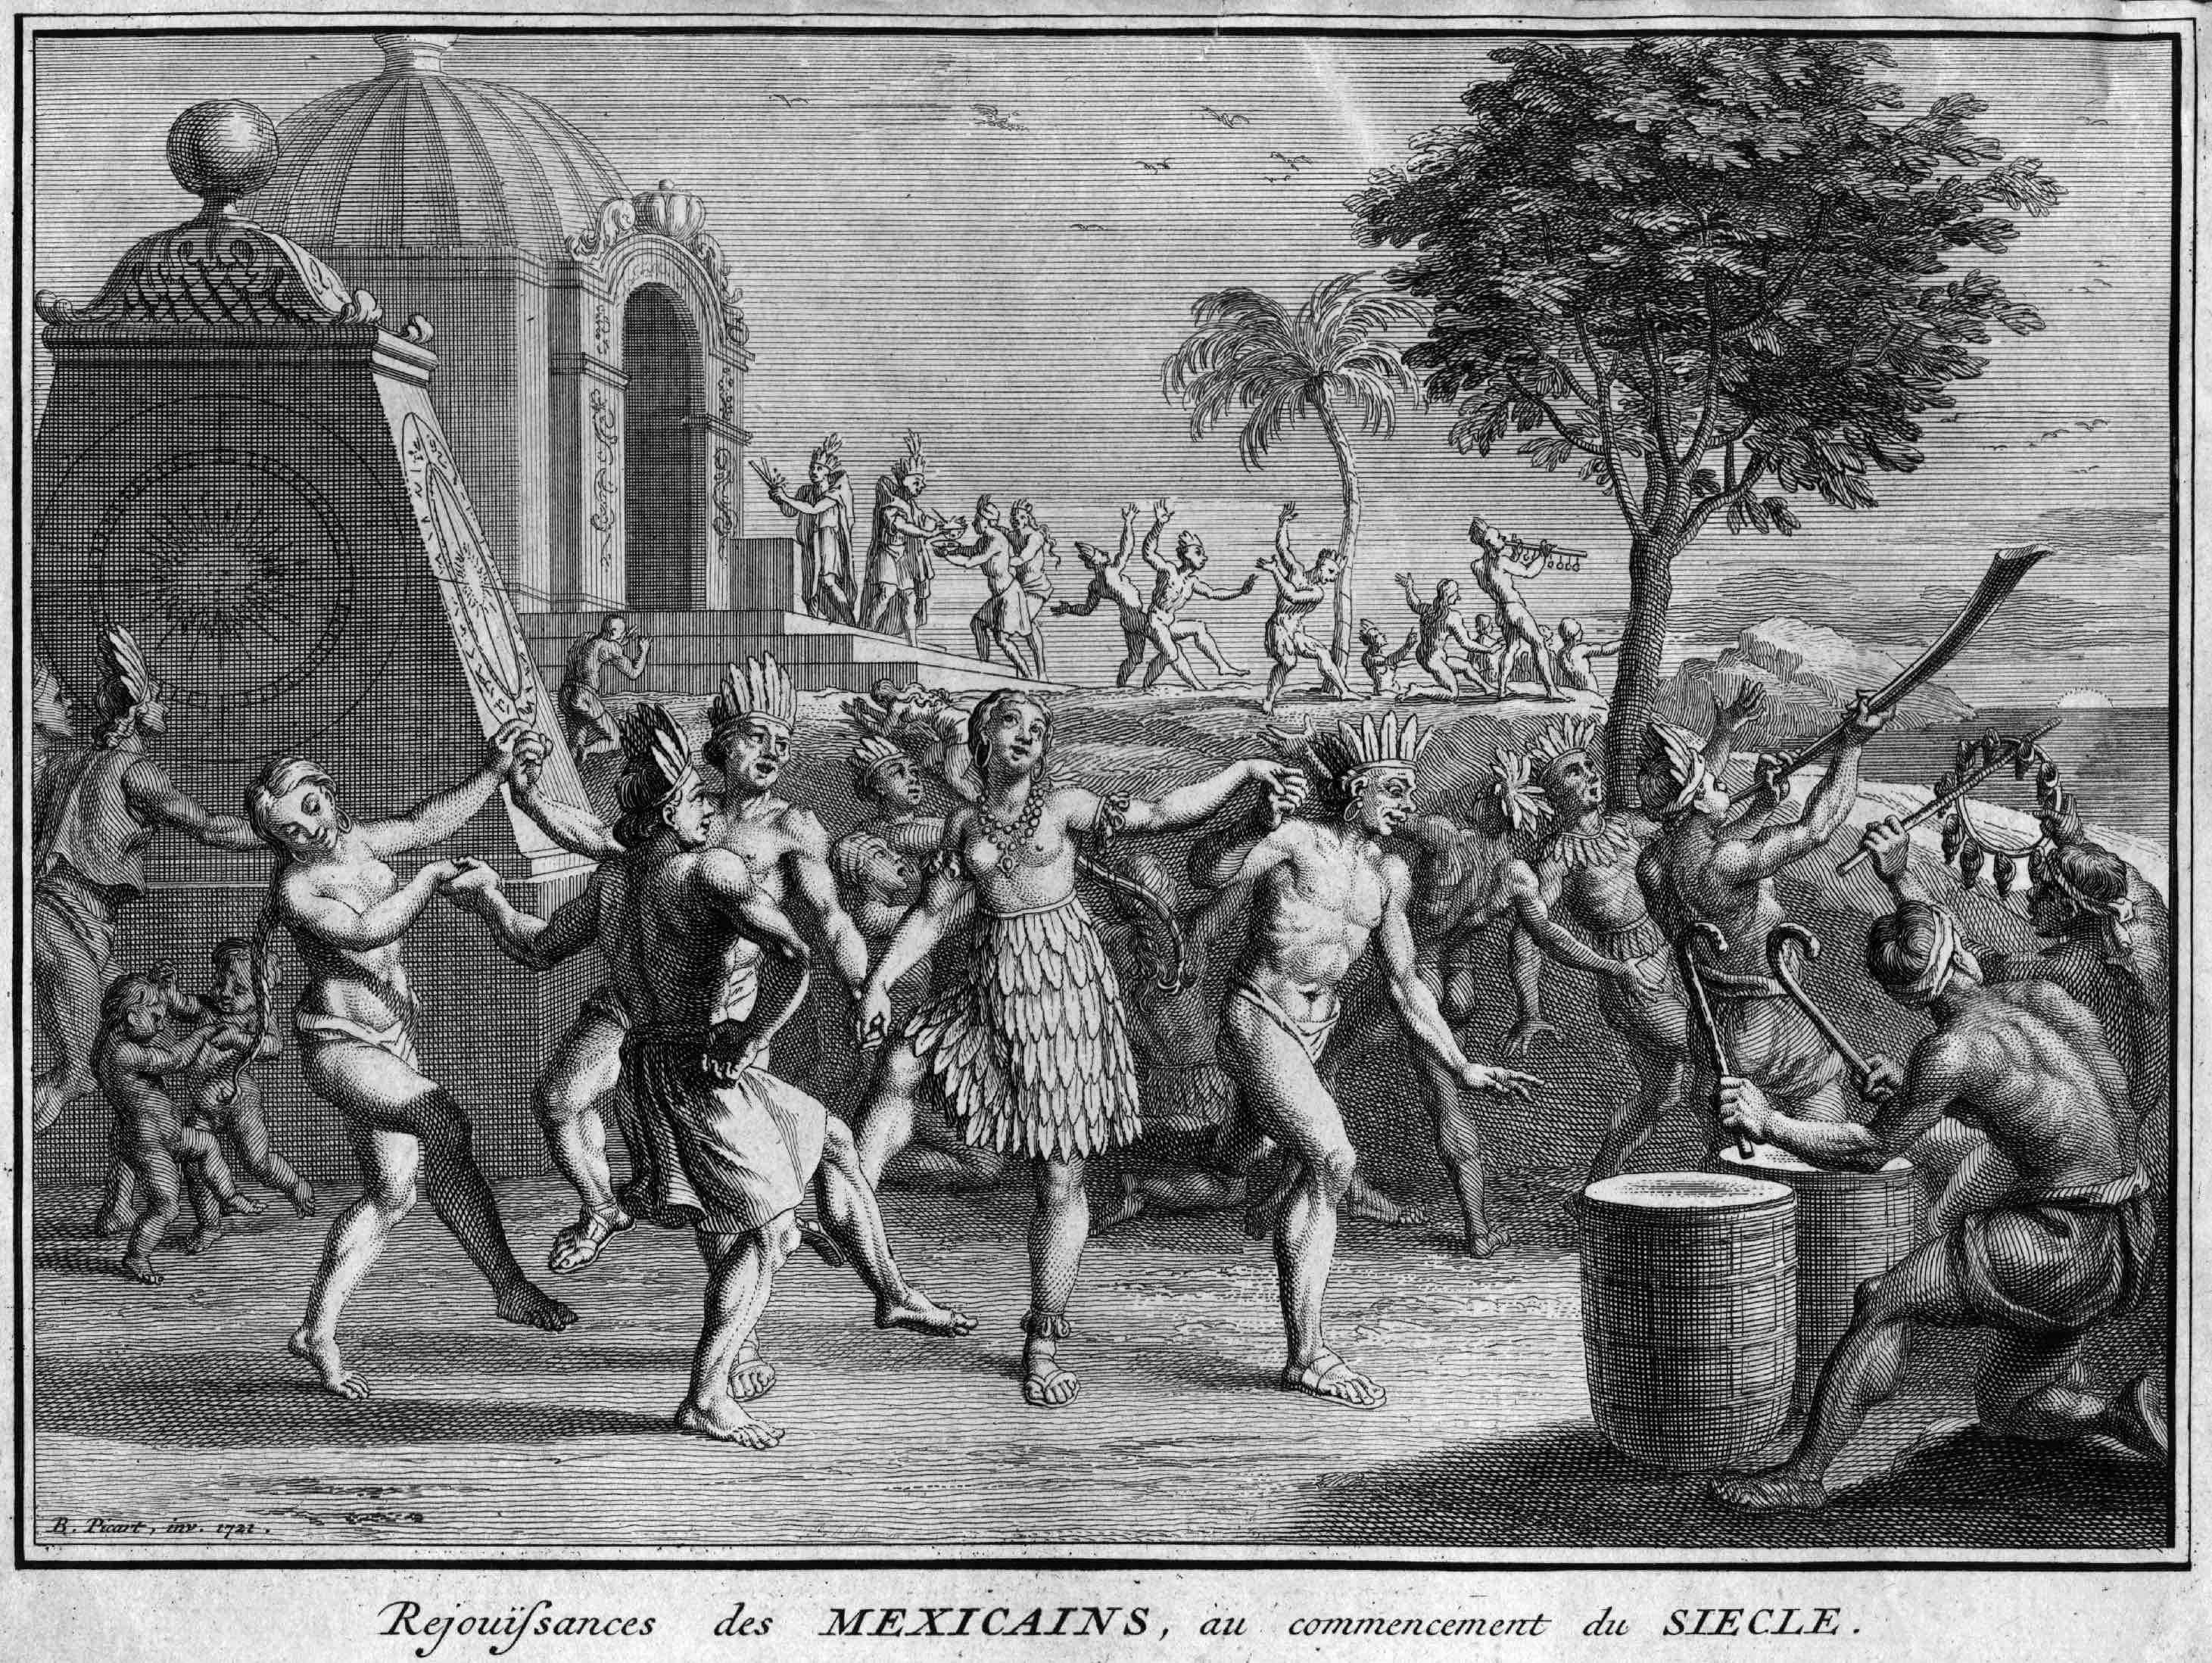 Noche Triste si aztecas derrotaron Hernán Cortés